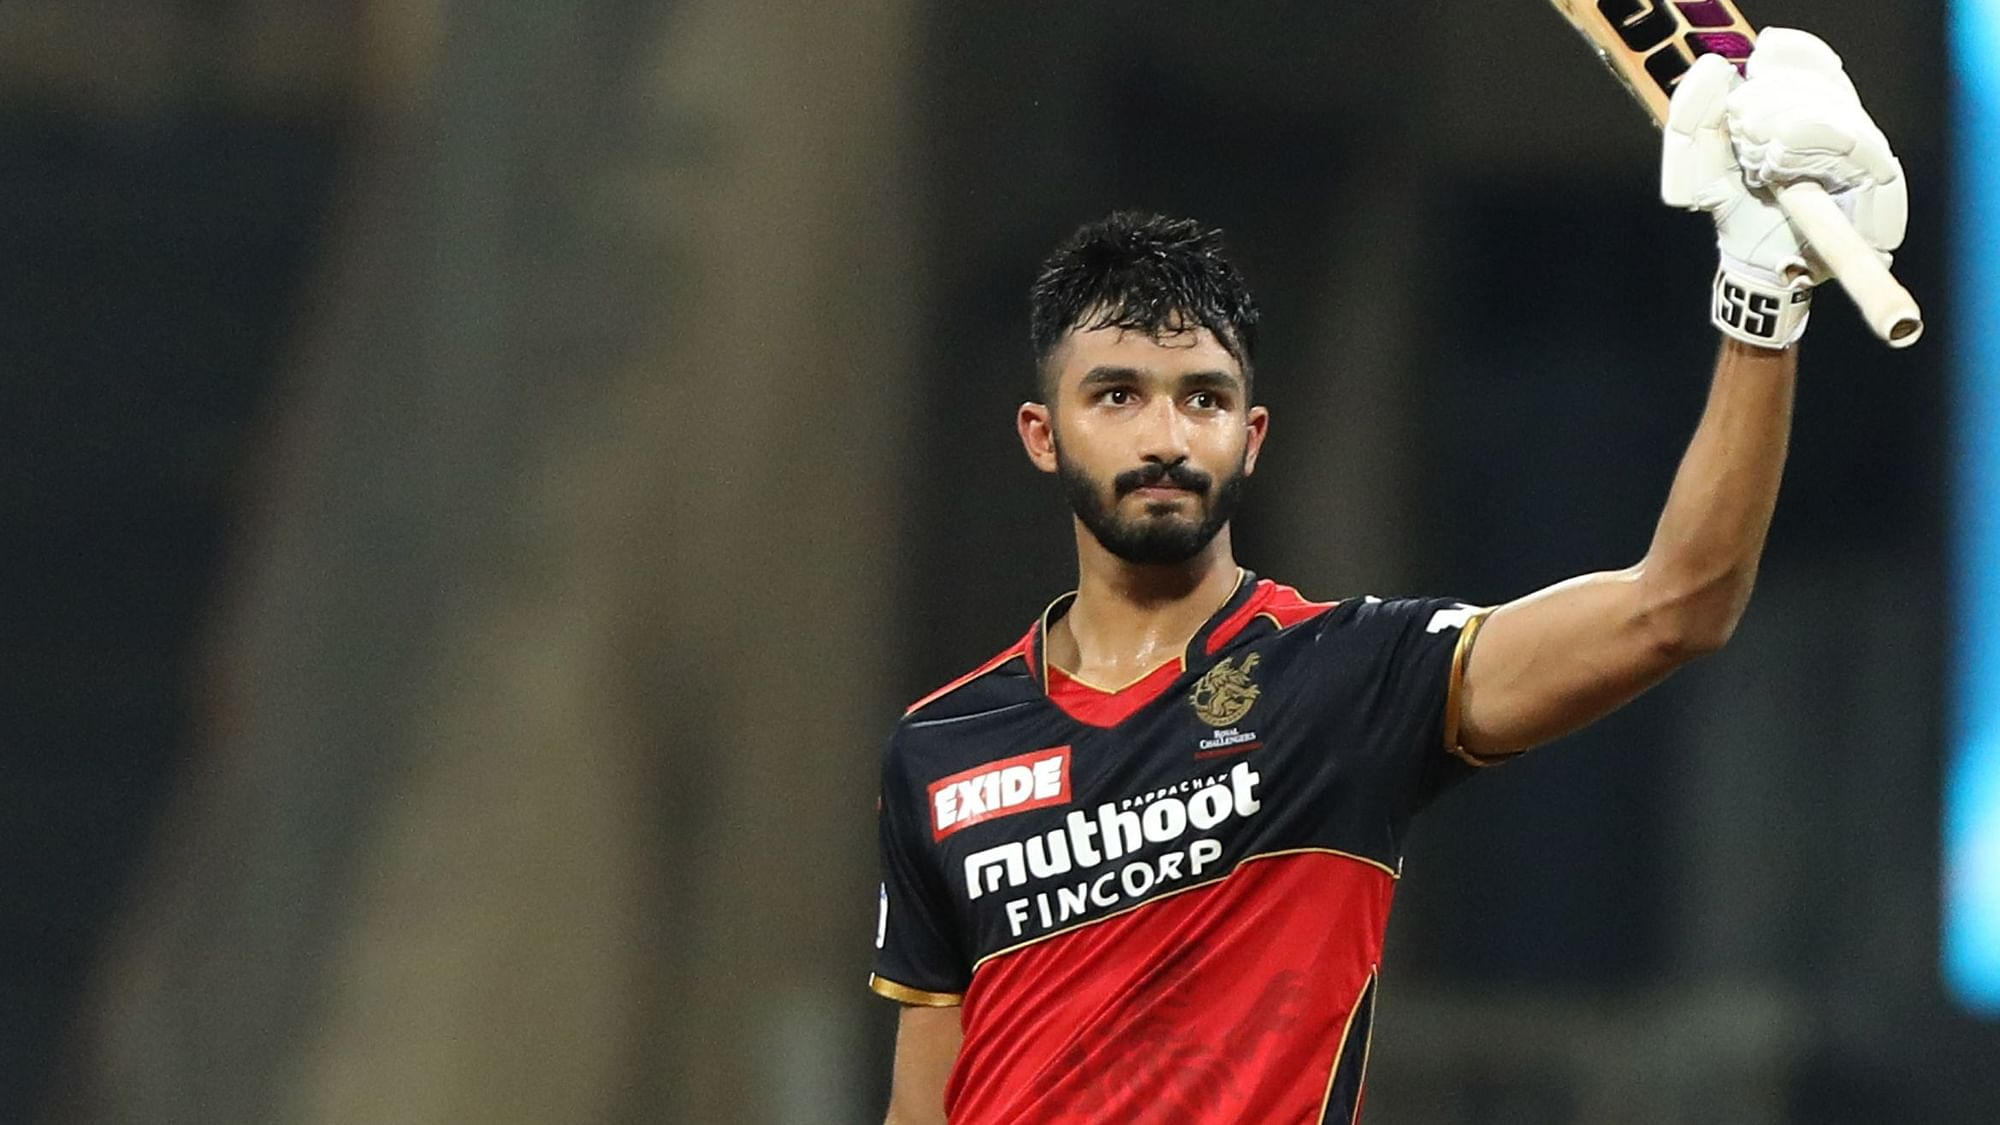 Missing The First Match Really Hurt Me: Devdutt Padikkal